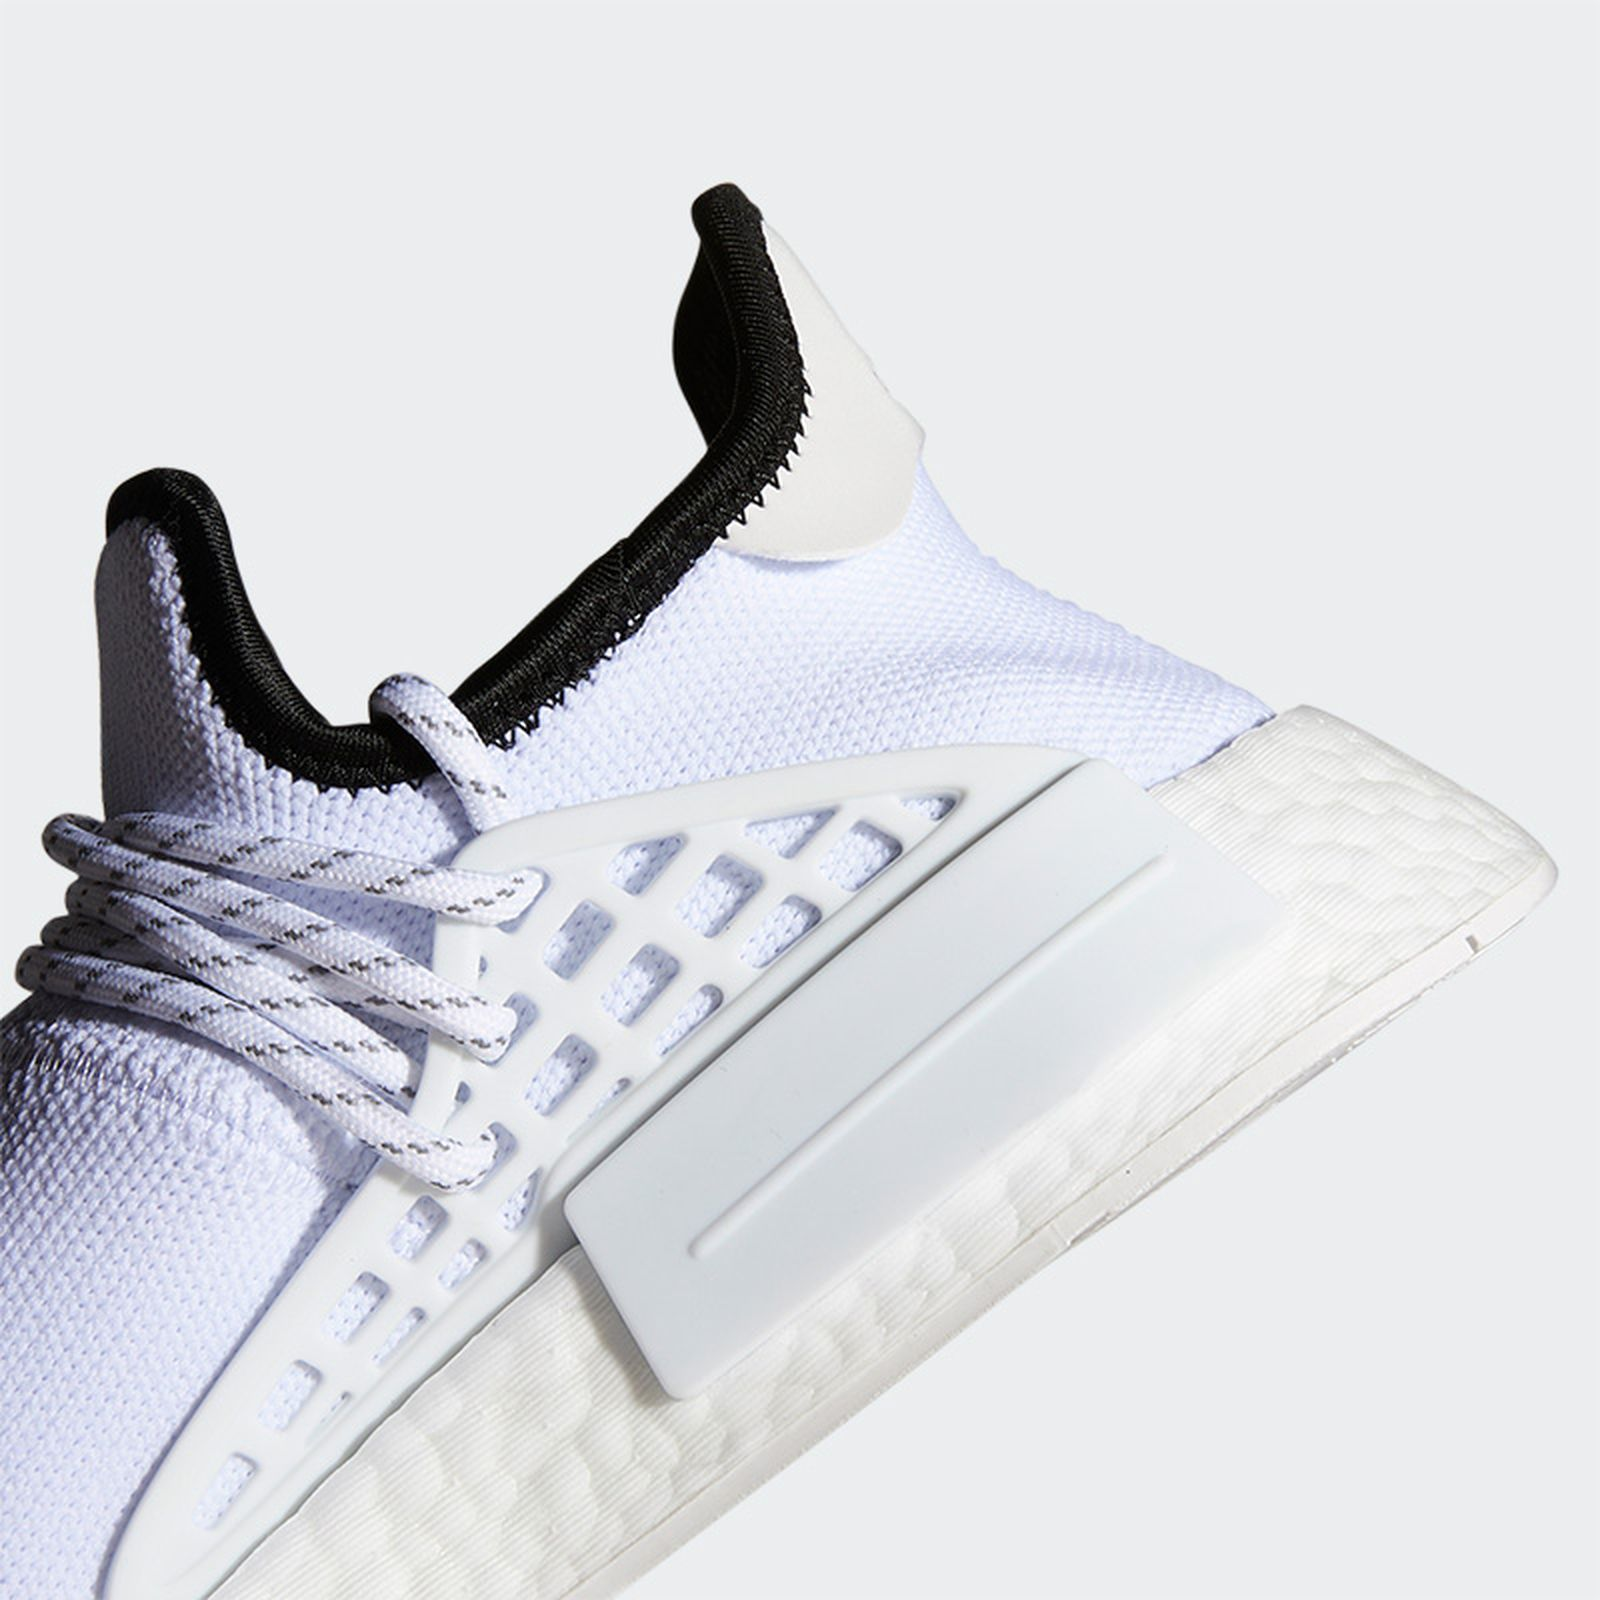 pharrell-williams-adidas-hu-nmd-white-release-date-price-03